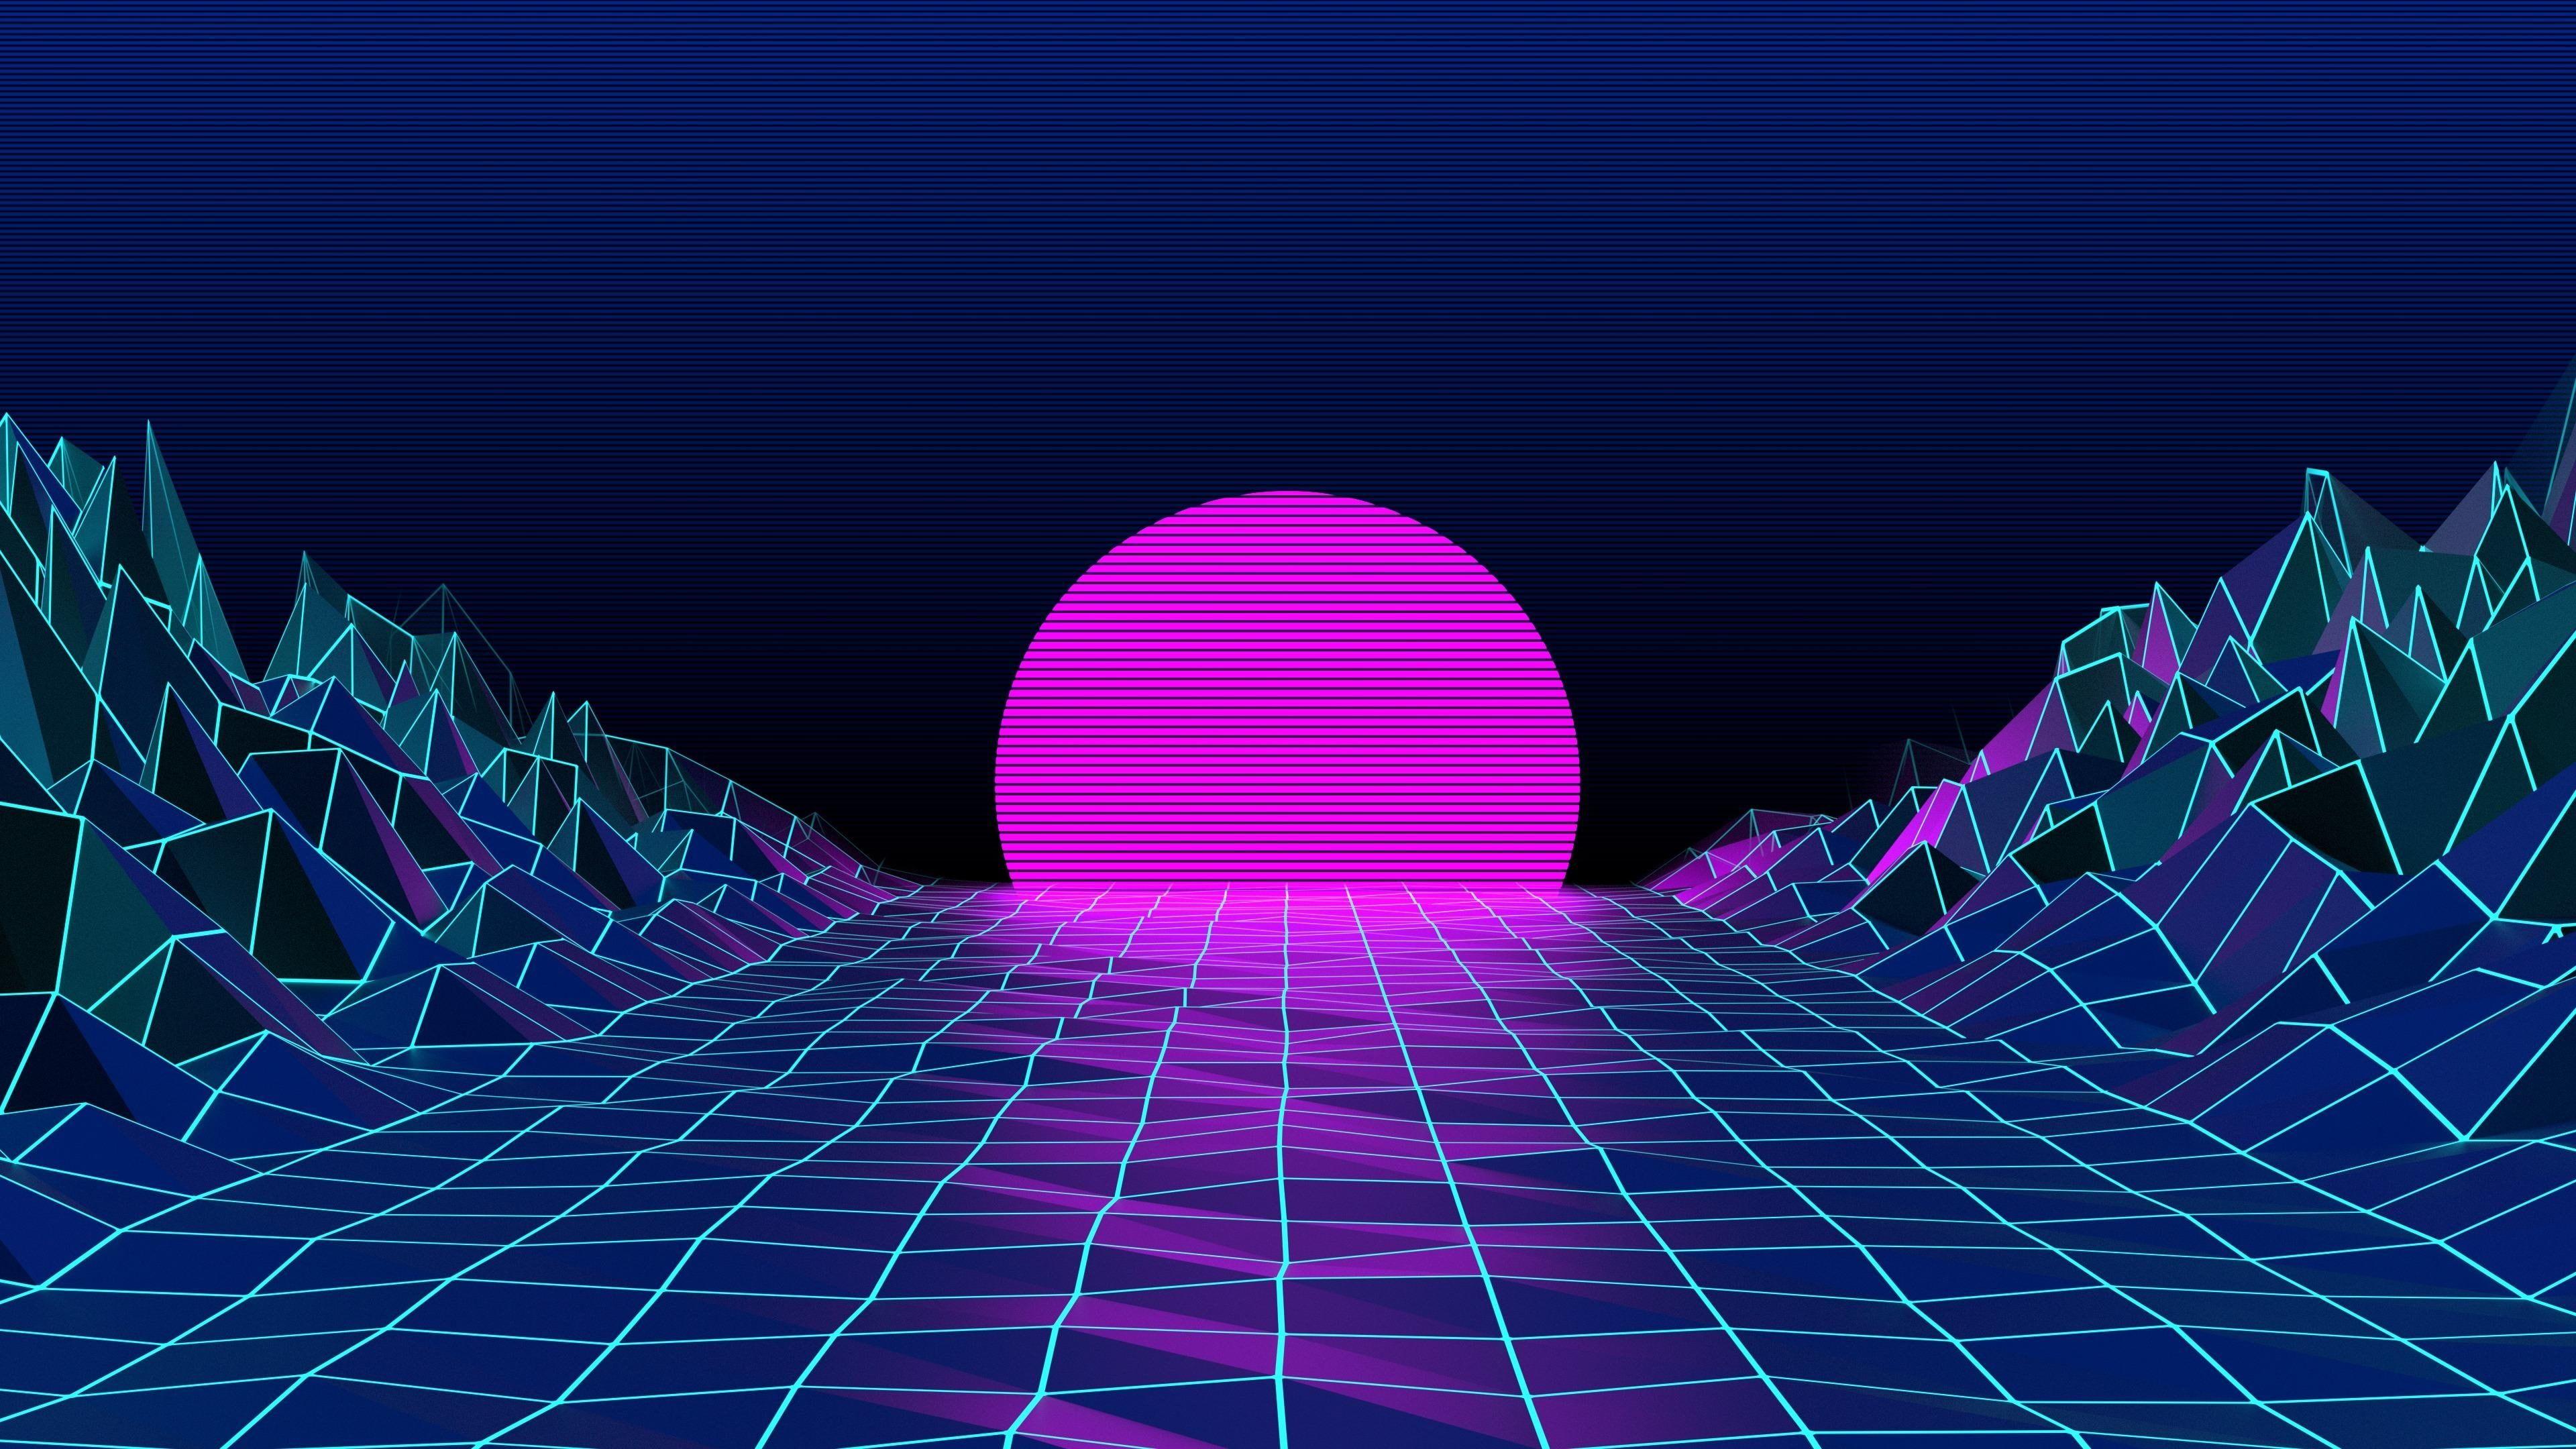 Retrowave Neon Digital Art Retro Style Sky Sun 80s Neon Art Graphic Design Graphics Vaporw Aesthetic Desktop Wallpaper Aesthetic Wallpapers Wallpaper Pc